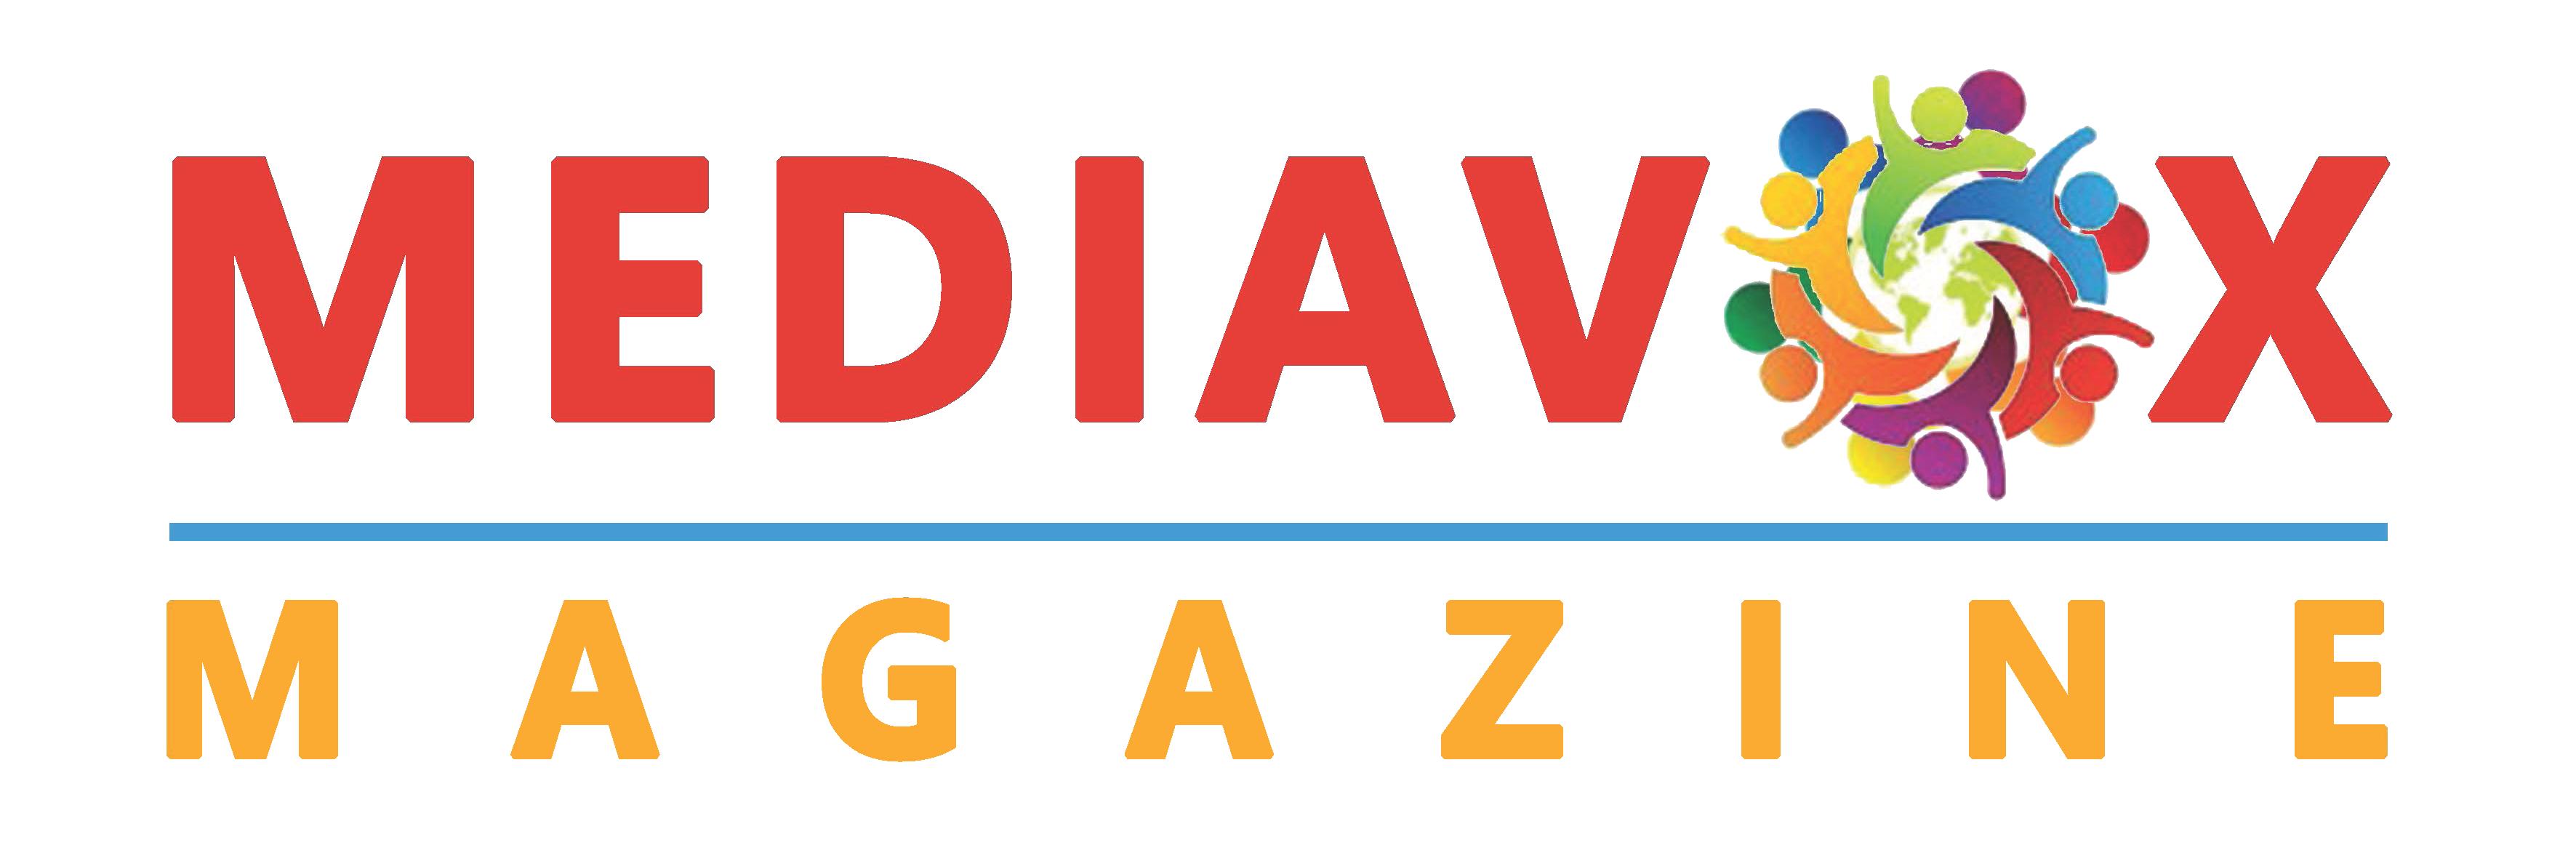 Mediavox Magazine